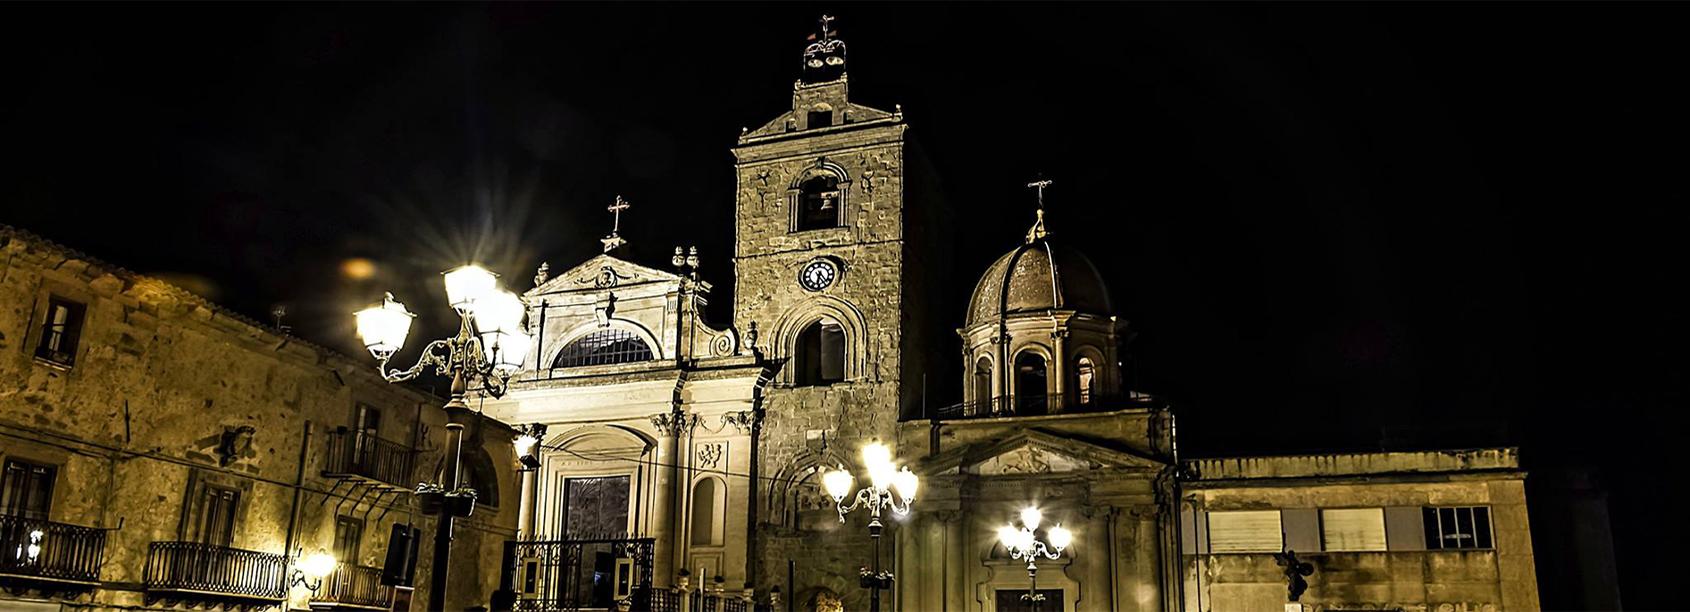 Slider1-cattedrale